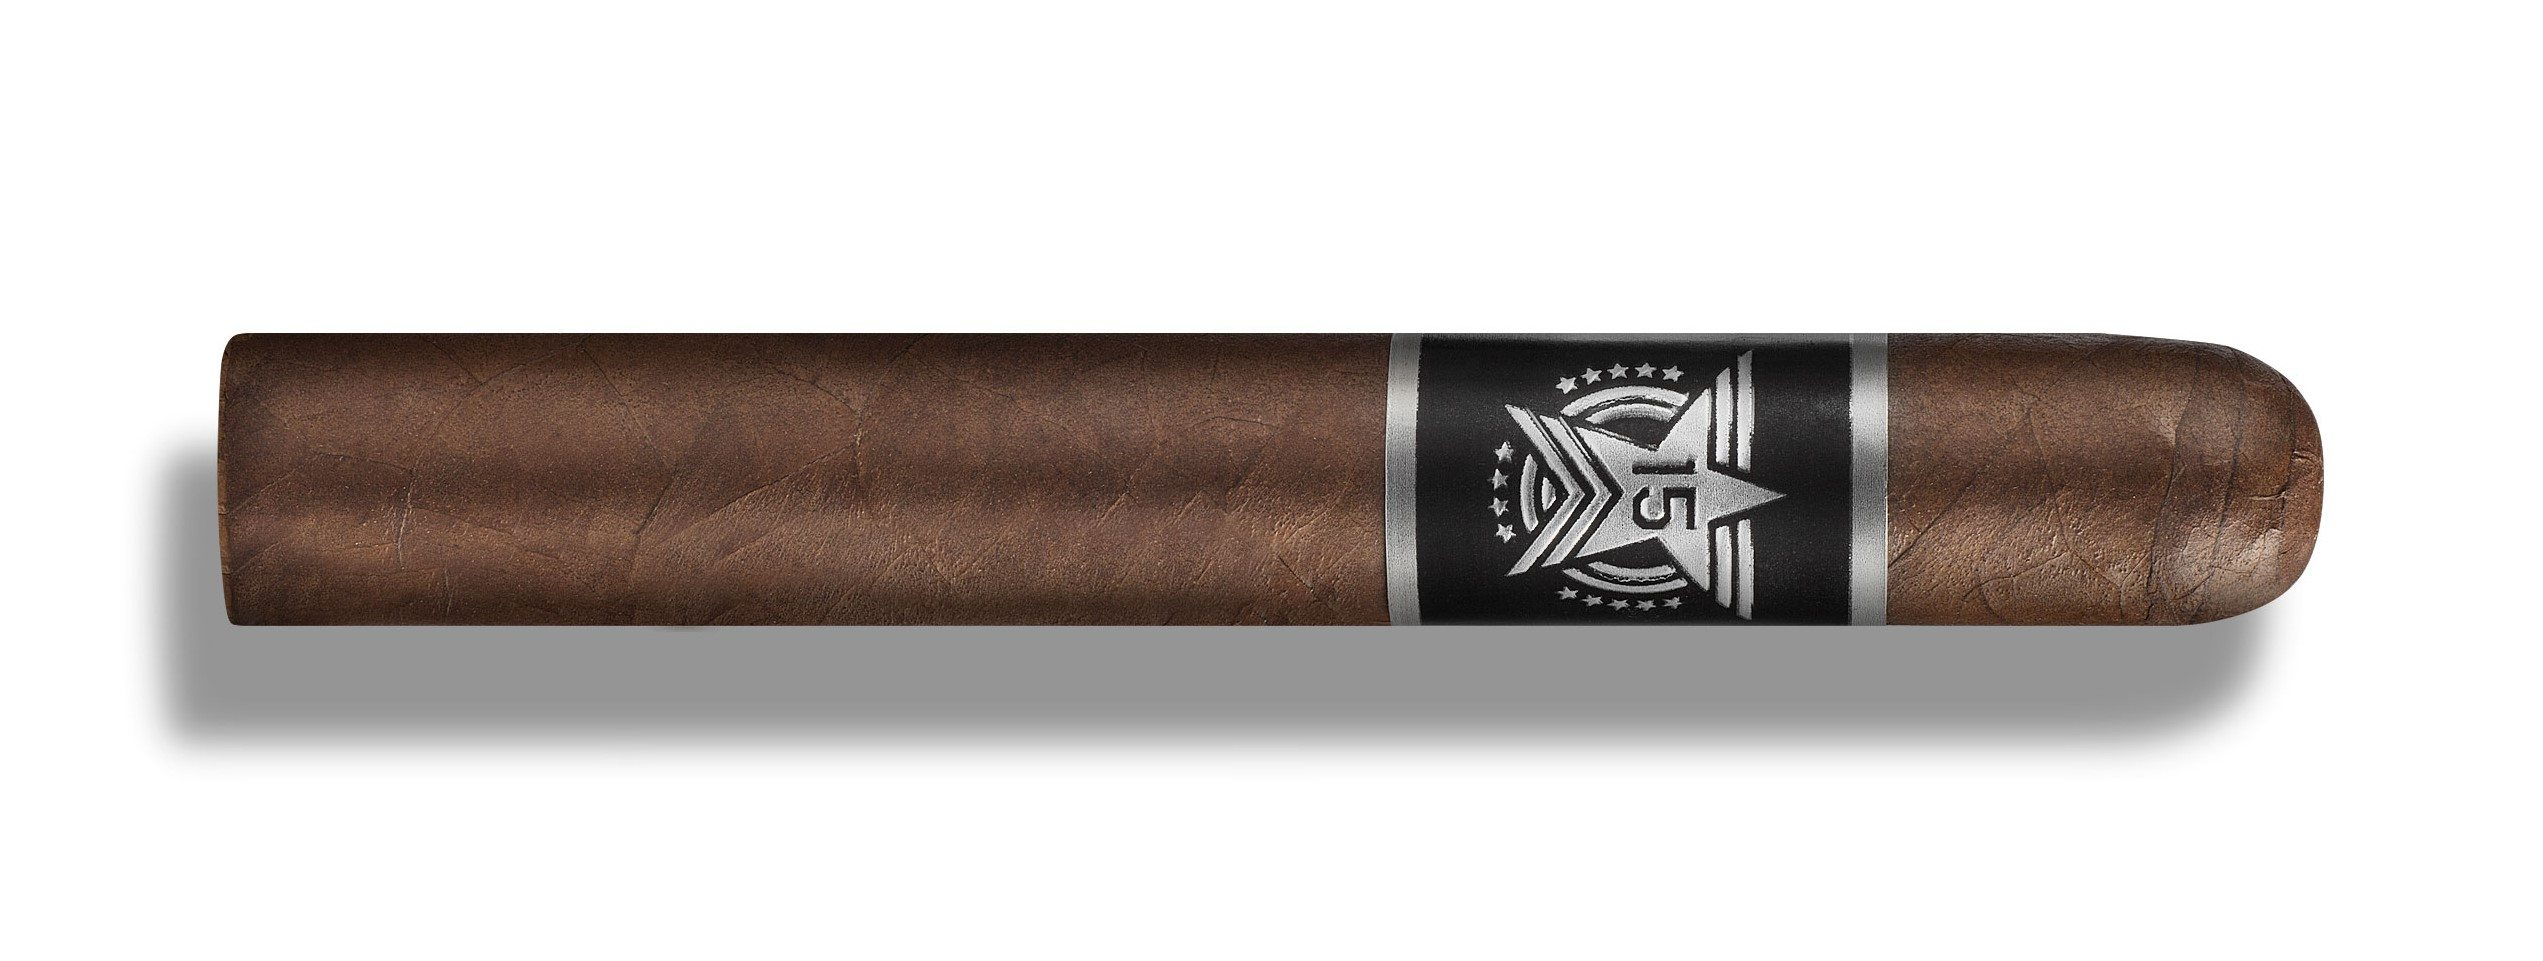 Cigar News: Camacho Introduces 2017 Camacho Liberty